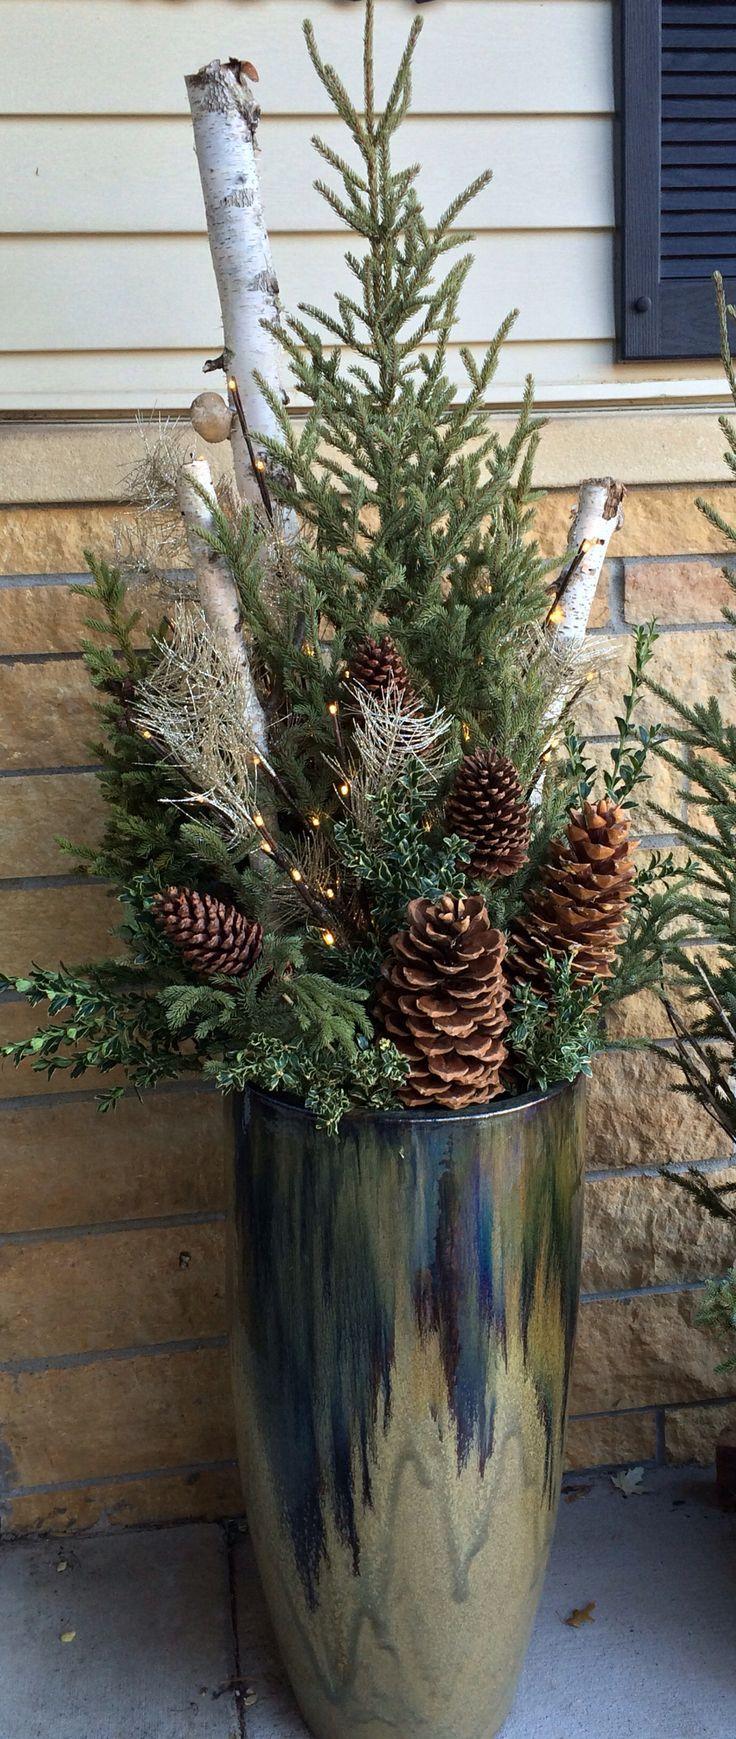 Winter pot, naturally!